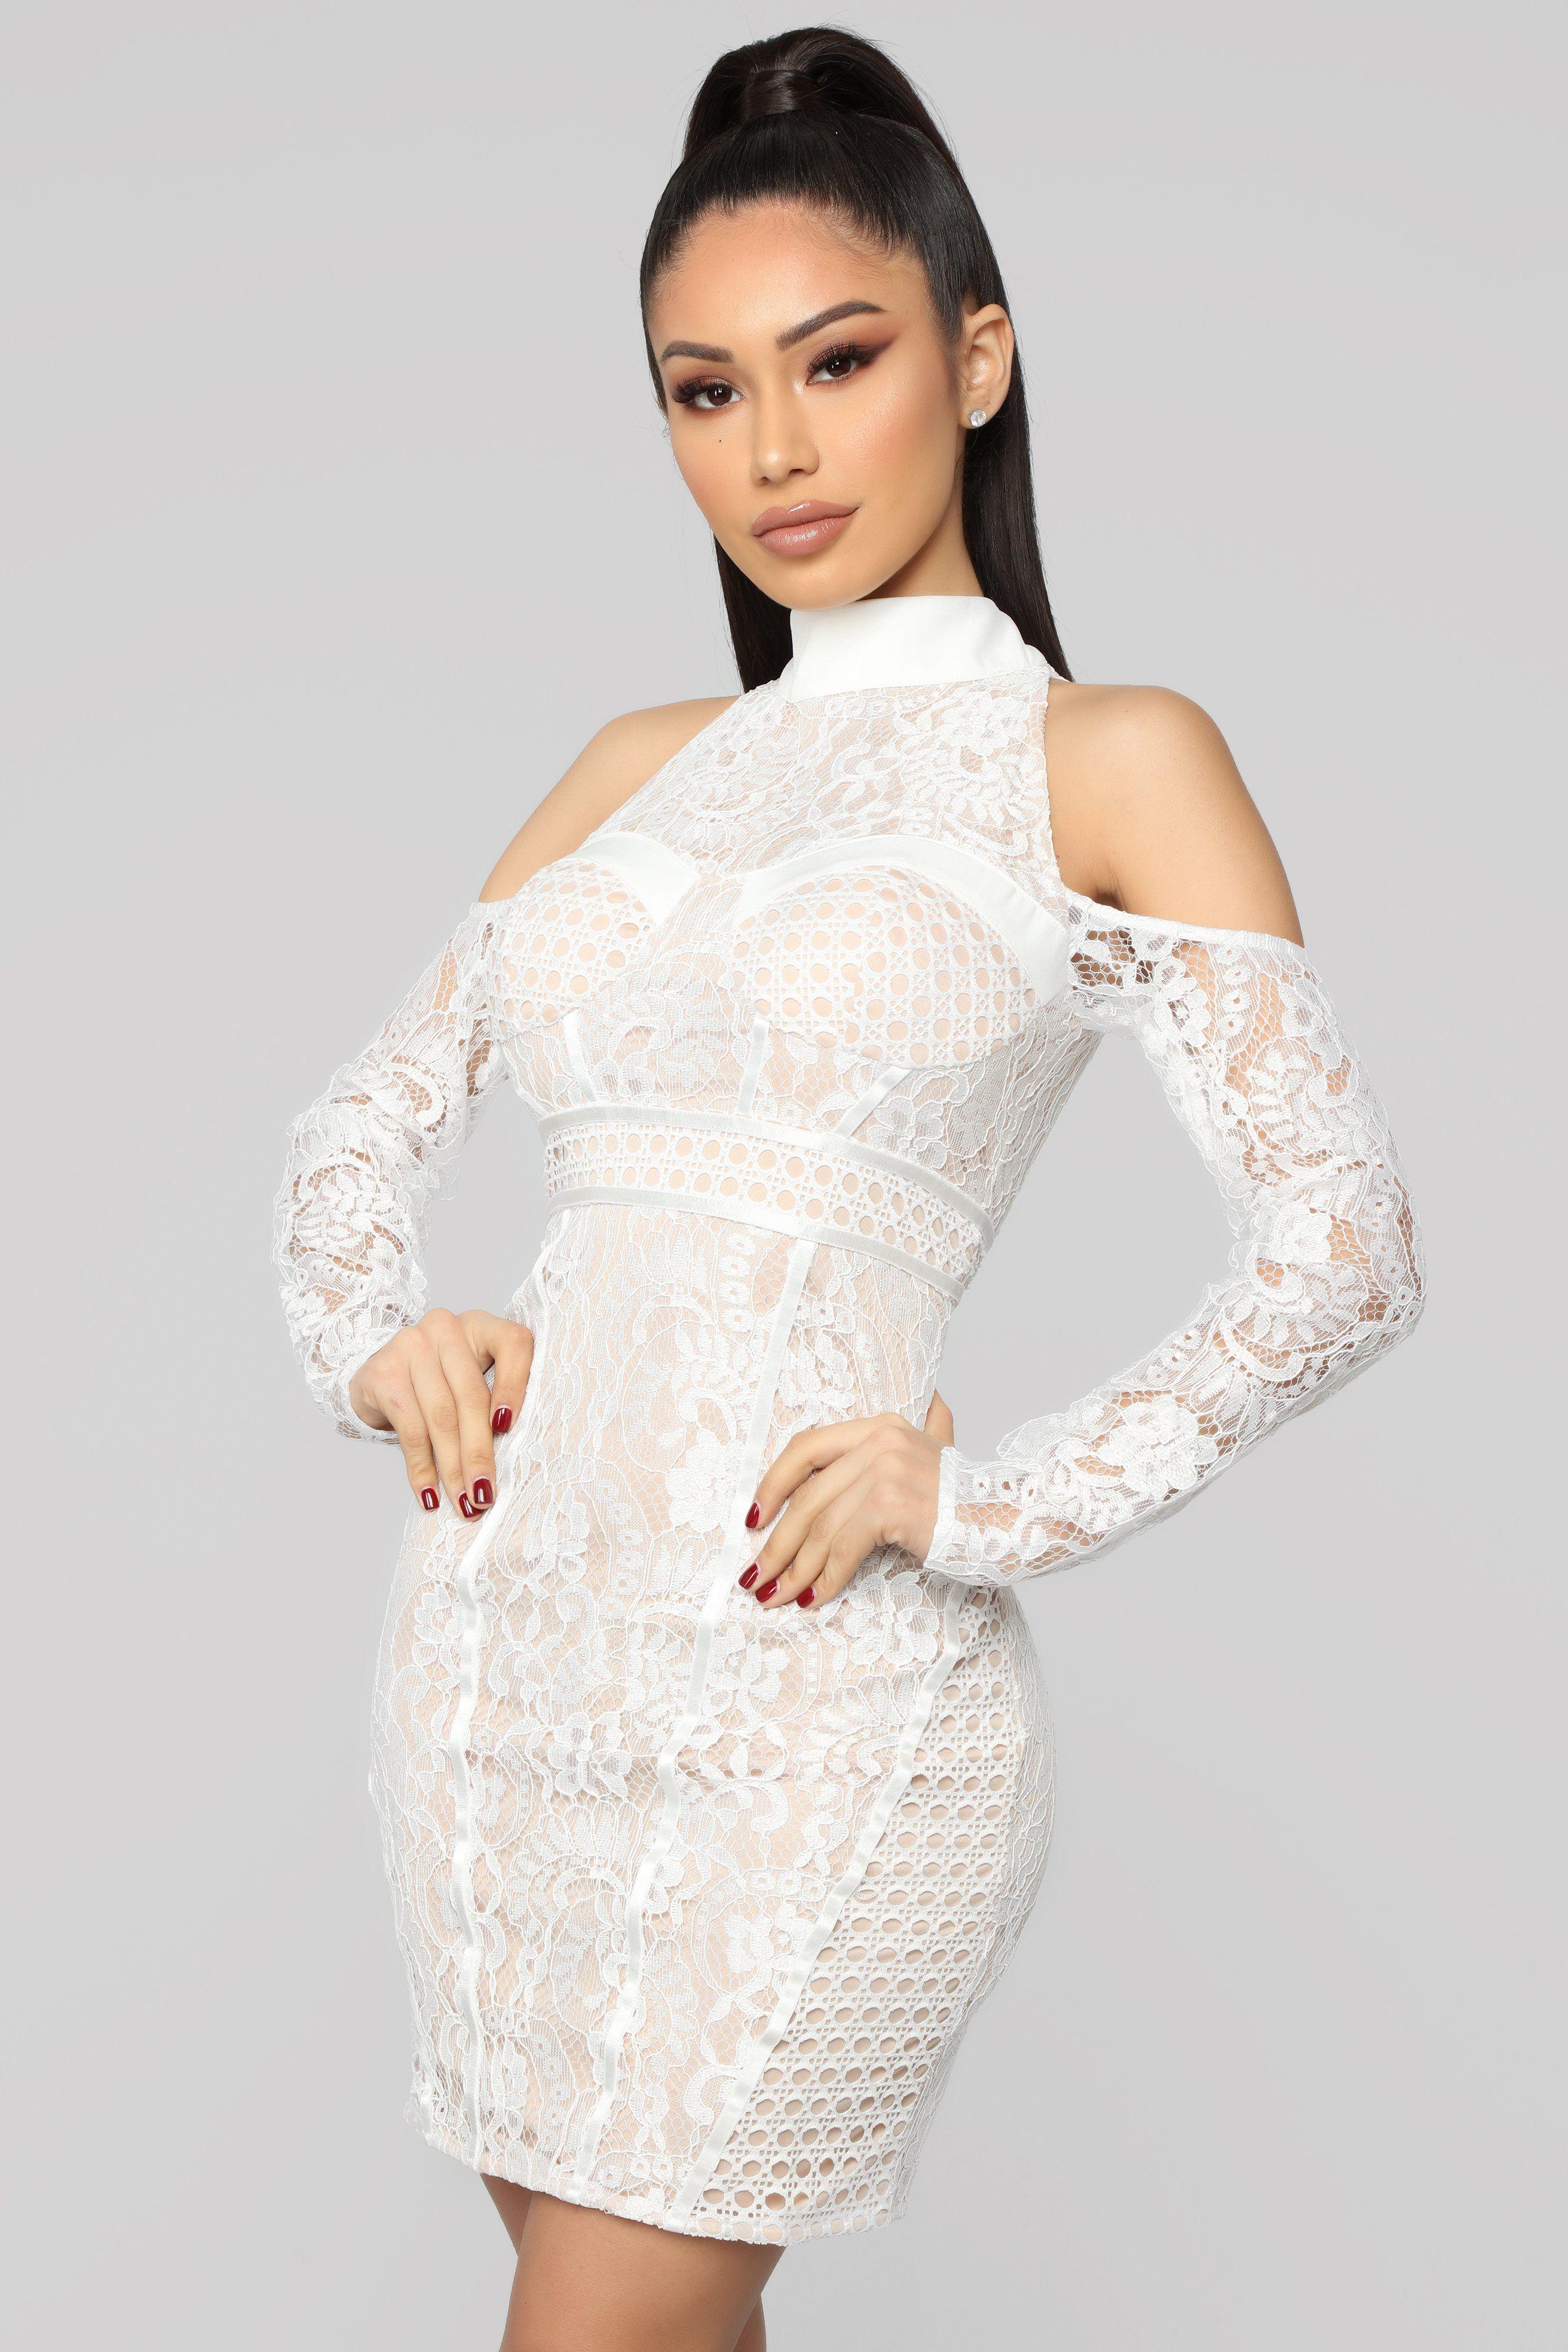 2596b362a2fe Ice Cold Lace Mini Dress - White Abiti Rinfrescanti